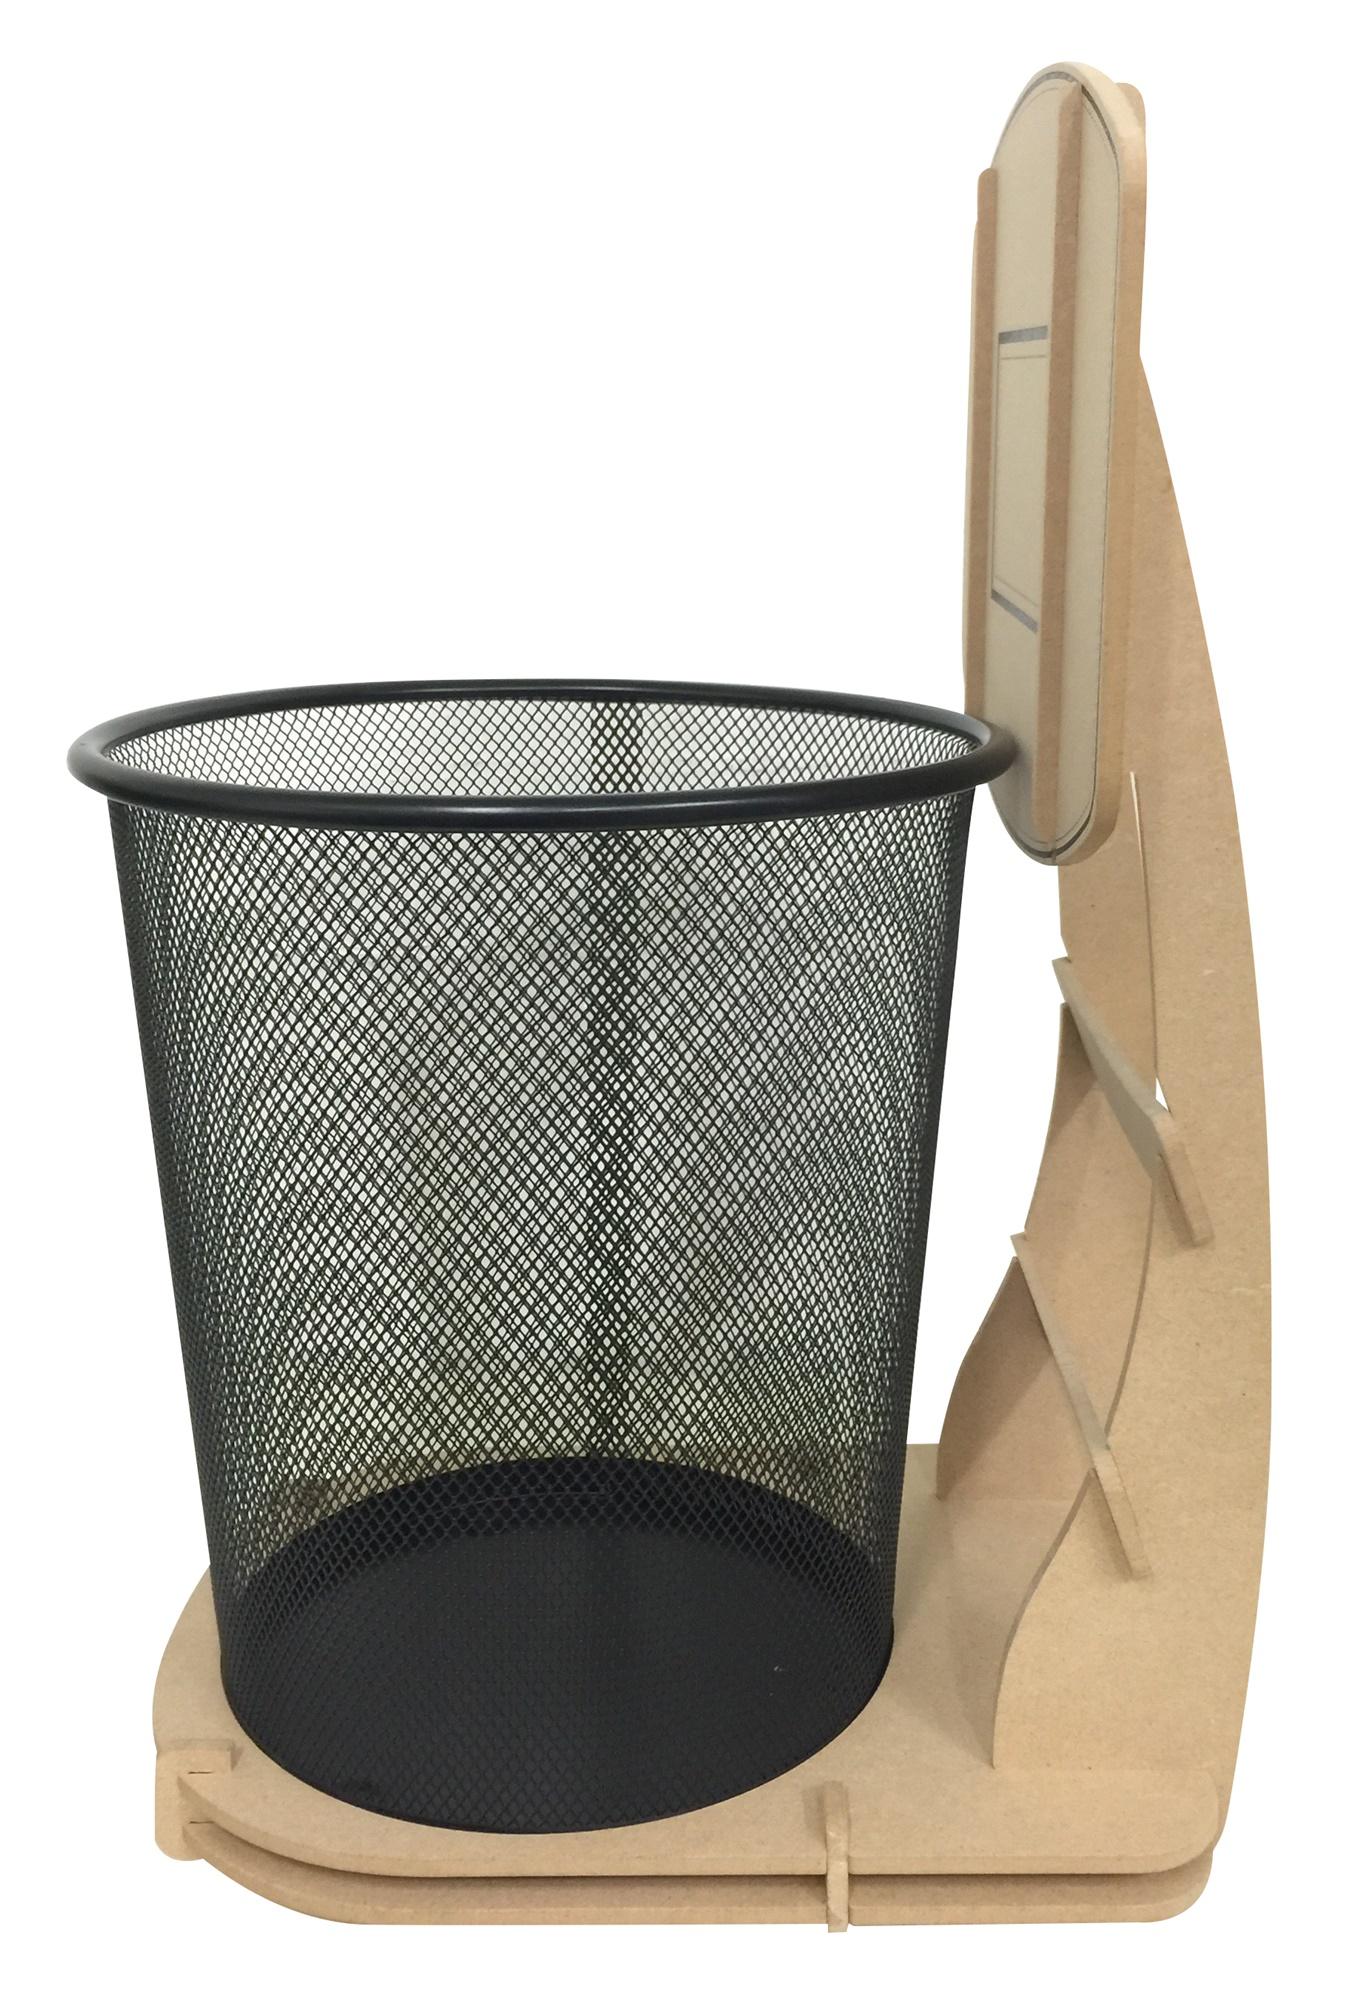 Basketball wastebaskets backboard paper bins cleaning household home decor gifts ebay - Basketball waste paper basket ...